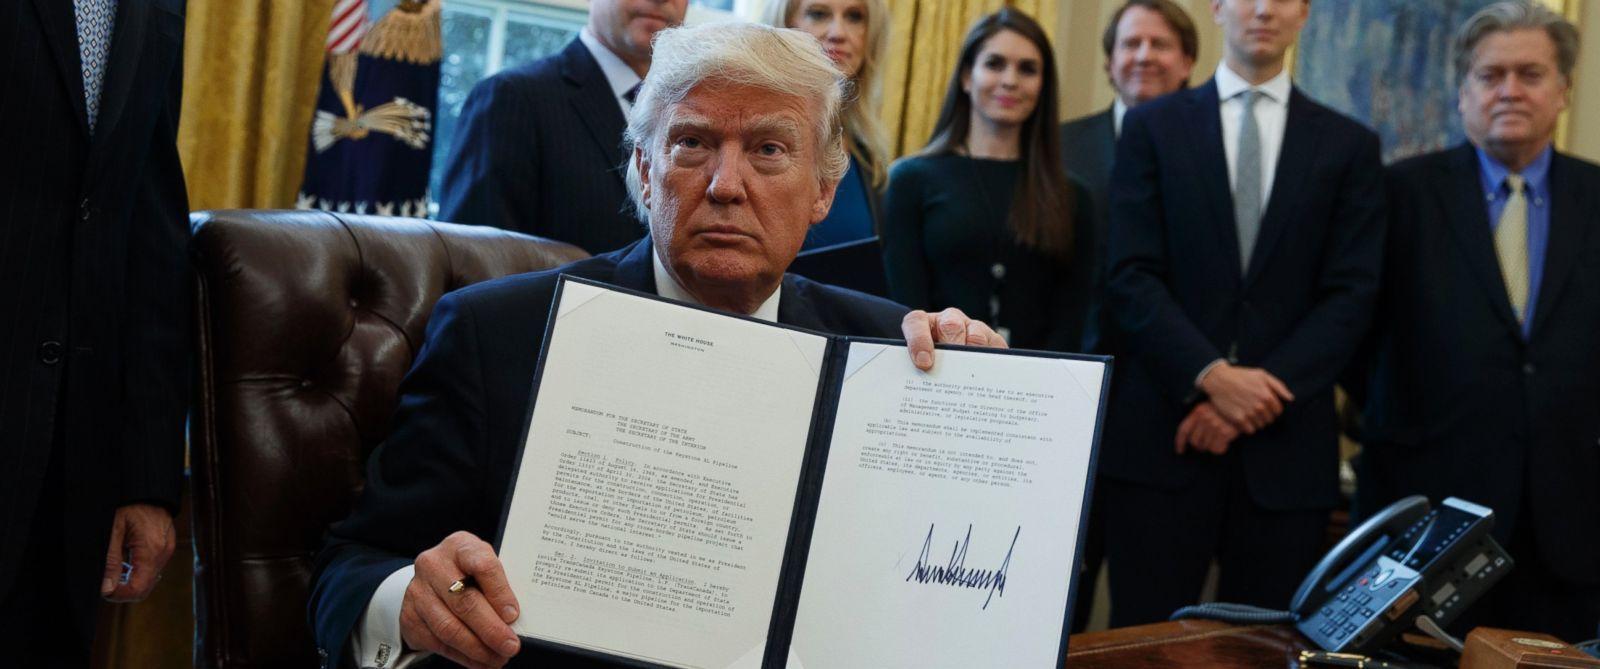 Trump's First Week as President